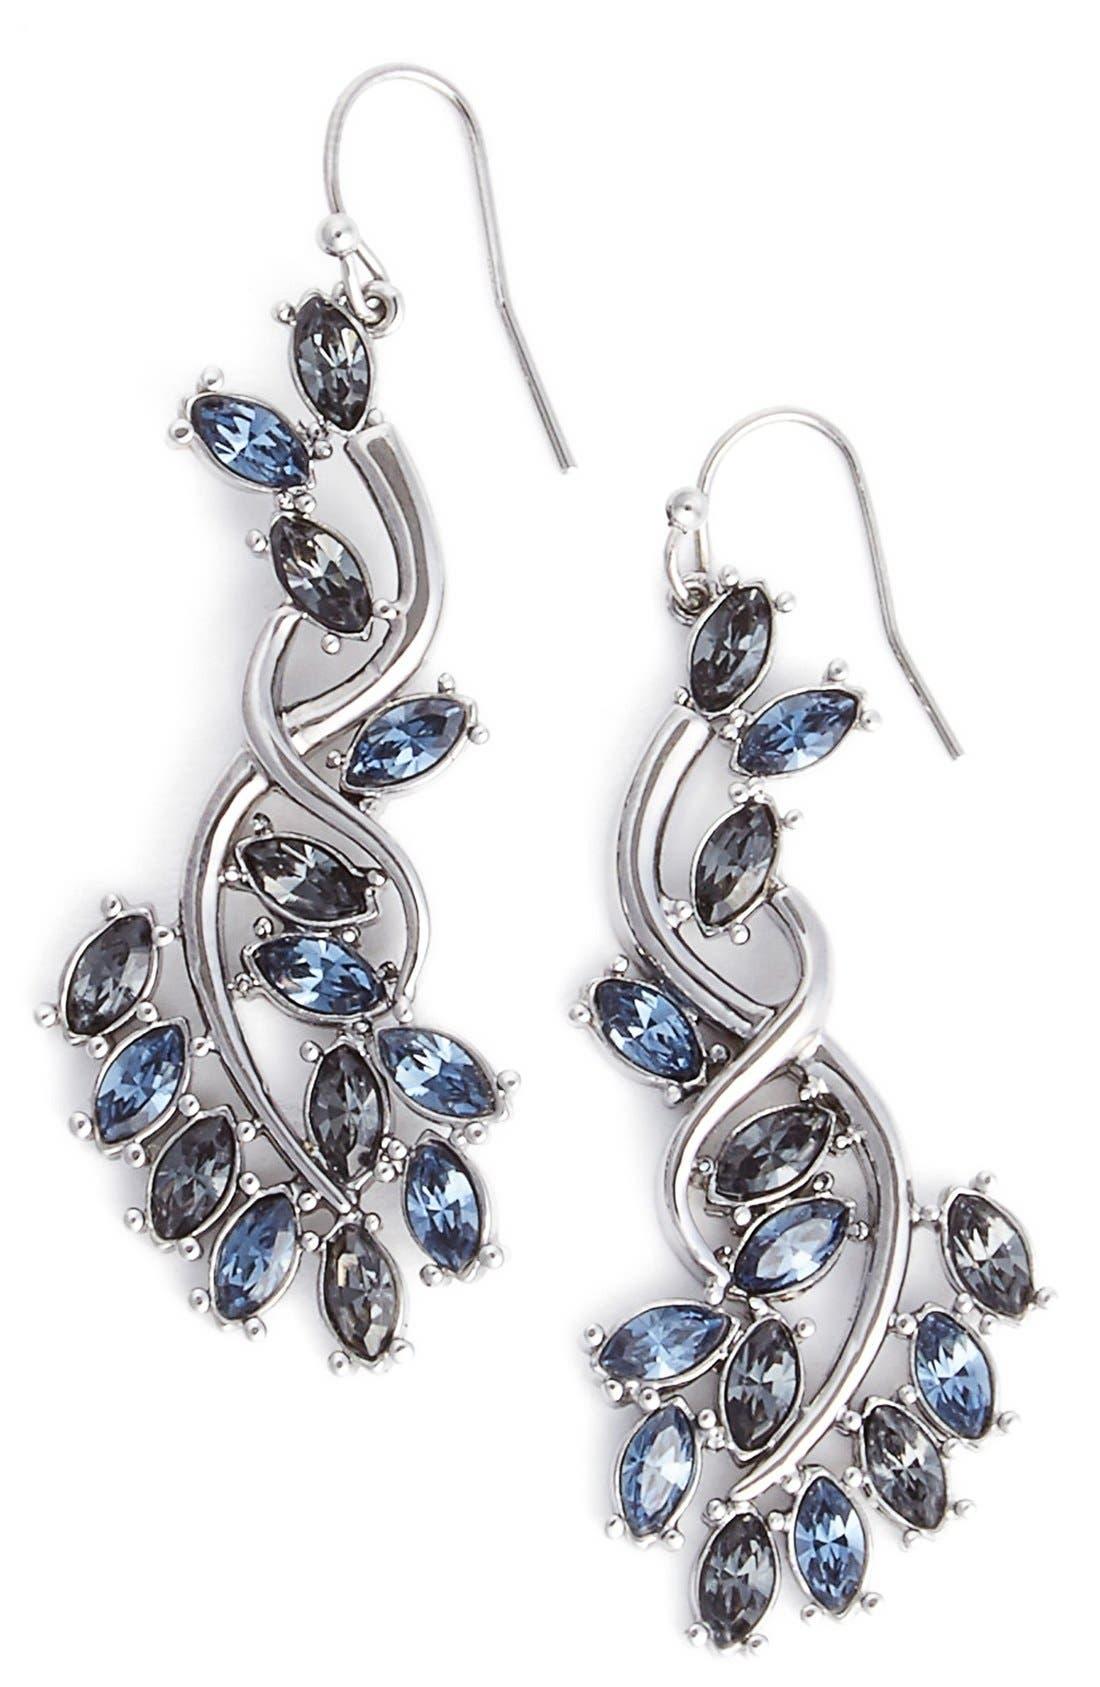 Main Image - St. John Collection 'Garden' Swarovski Crystal Drop Earrings